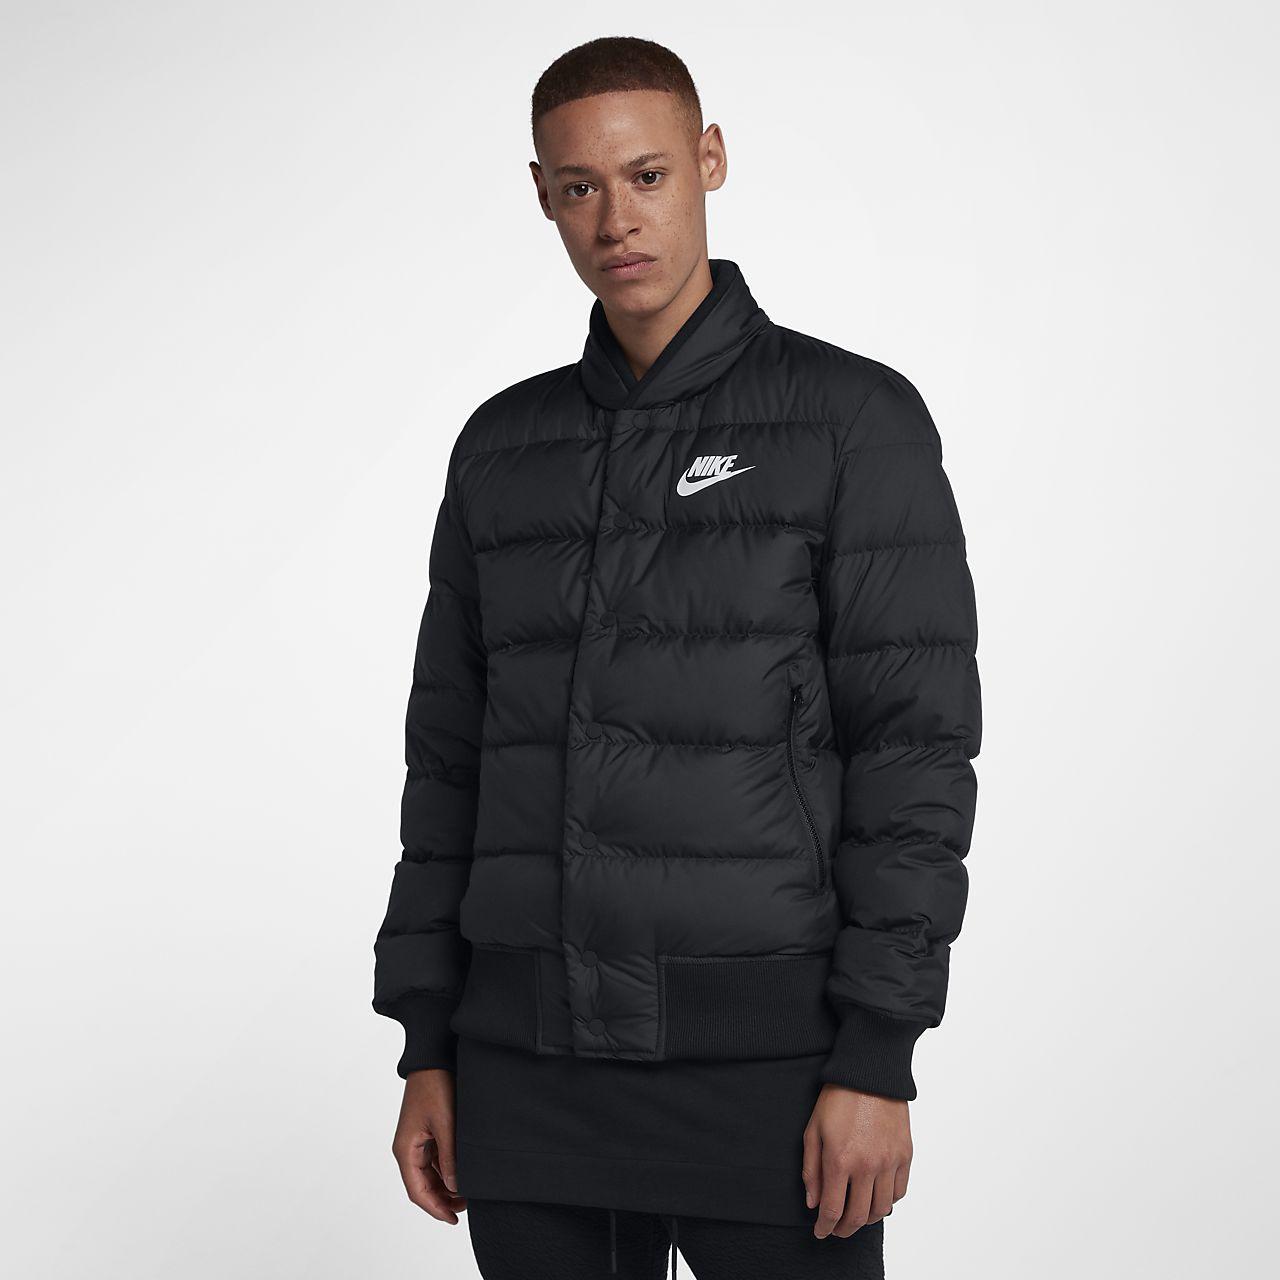 54d0d3c0babf Nike Sportswear Down Fill Men s Bomber Jacket. Nike.com ZA